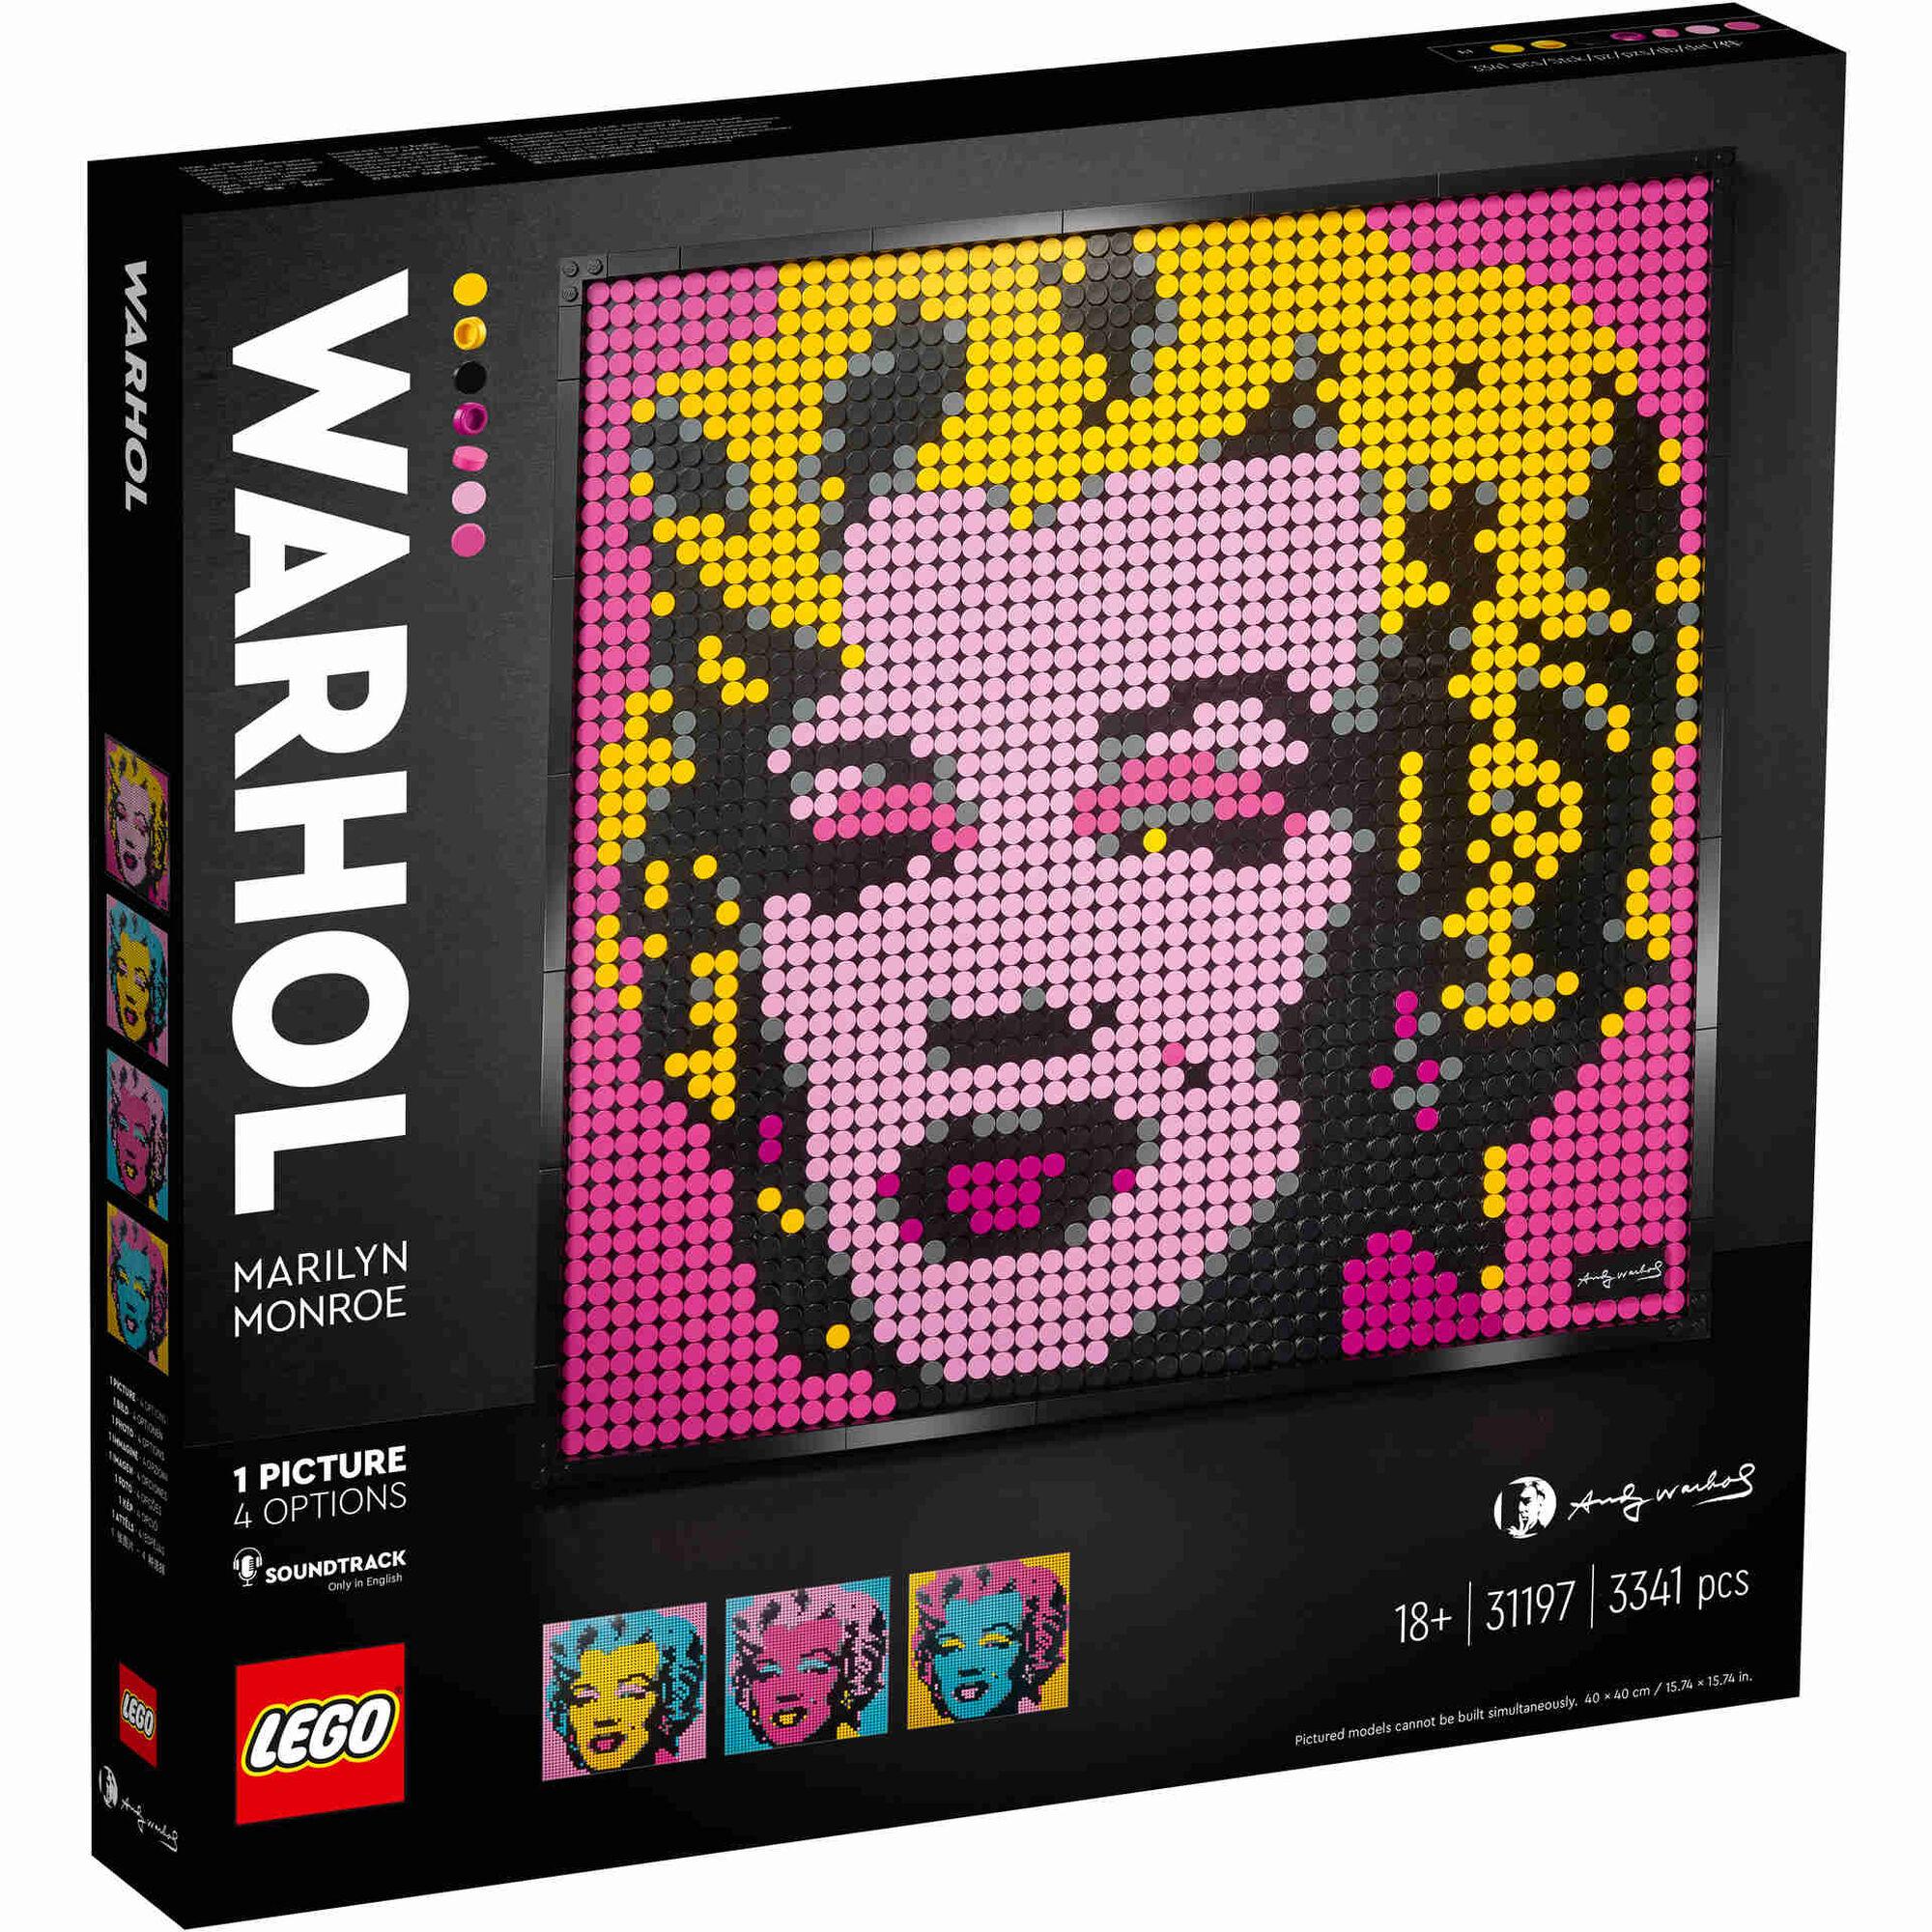 Andy Warhol'S Marilyn Monroe - 31197